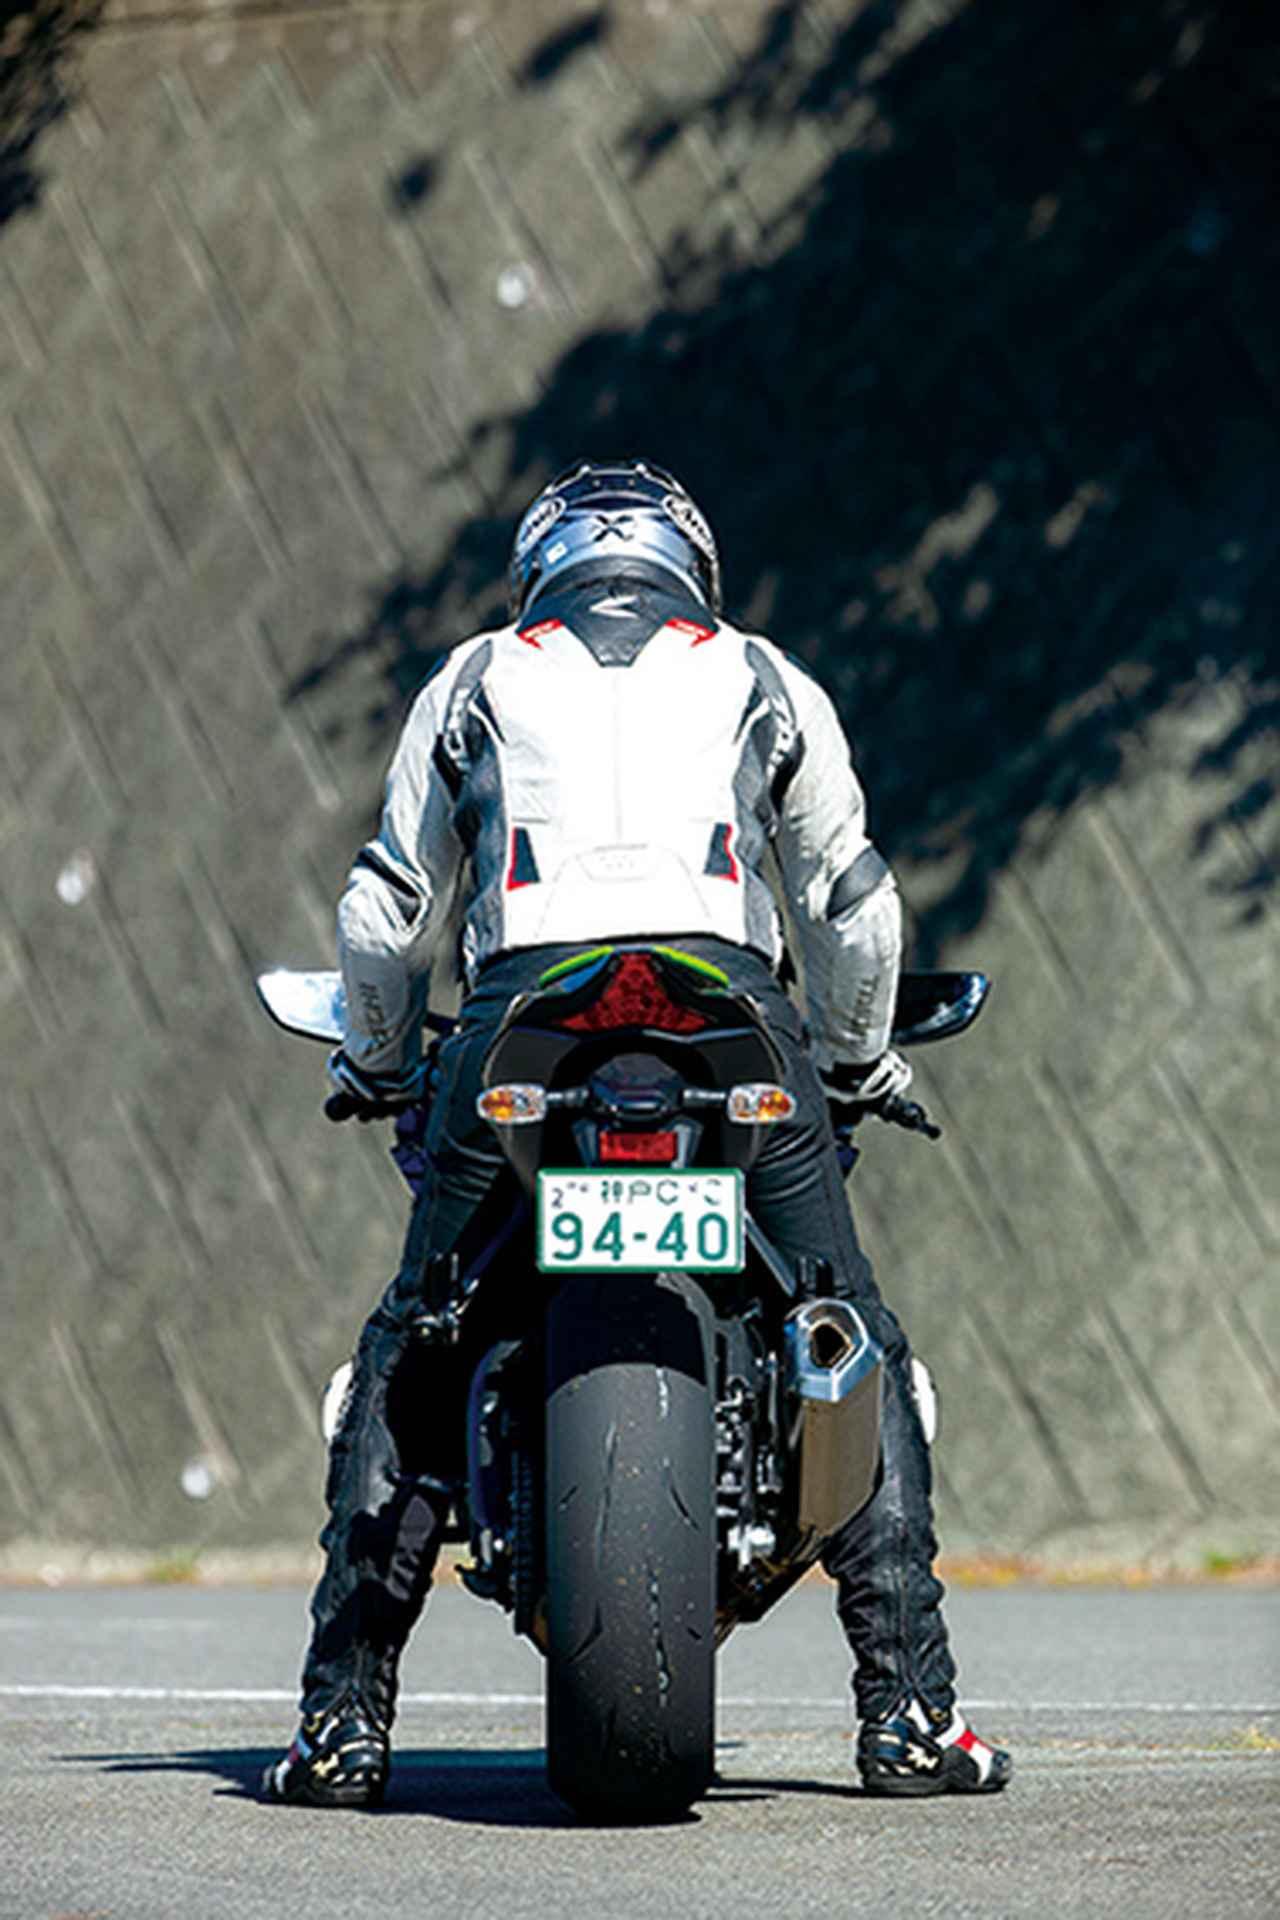 Images : 15番目の画像 - 「スーパーバイク最強の1台!『KAWASAKI NINJA ZX-10R SE』#試乗インプレ」のアルバム - webオートバイ